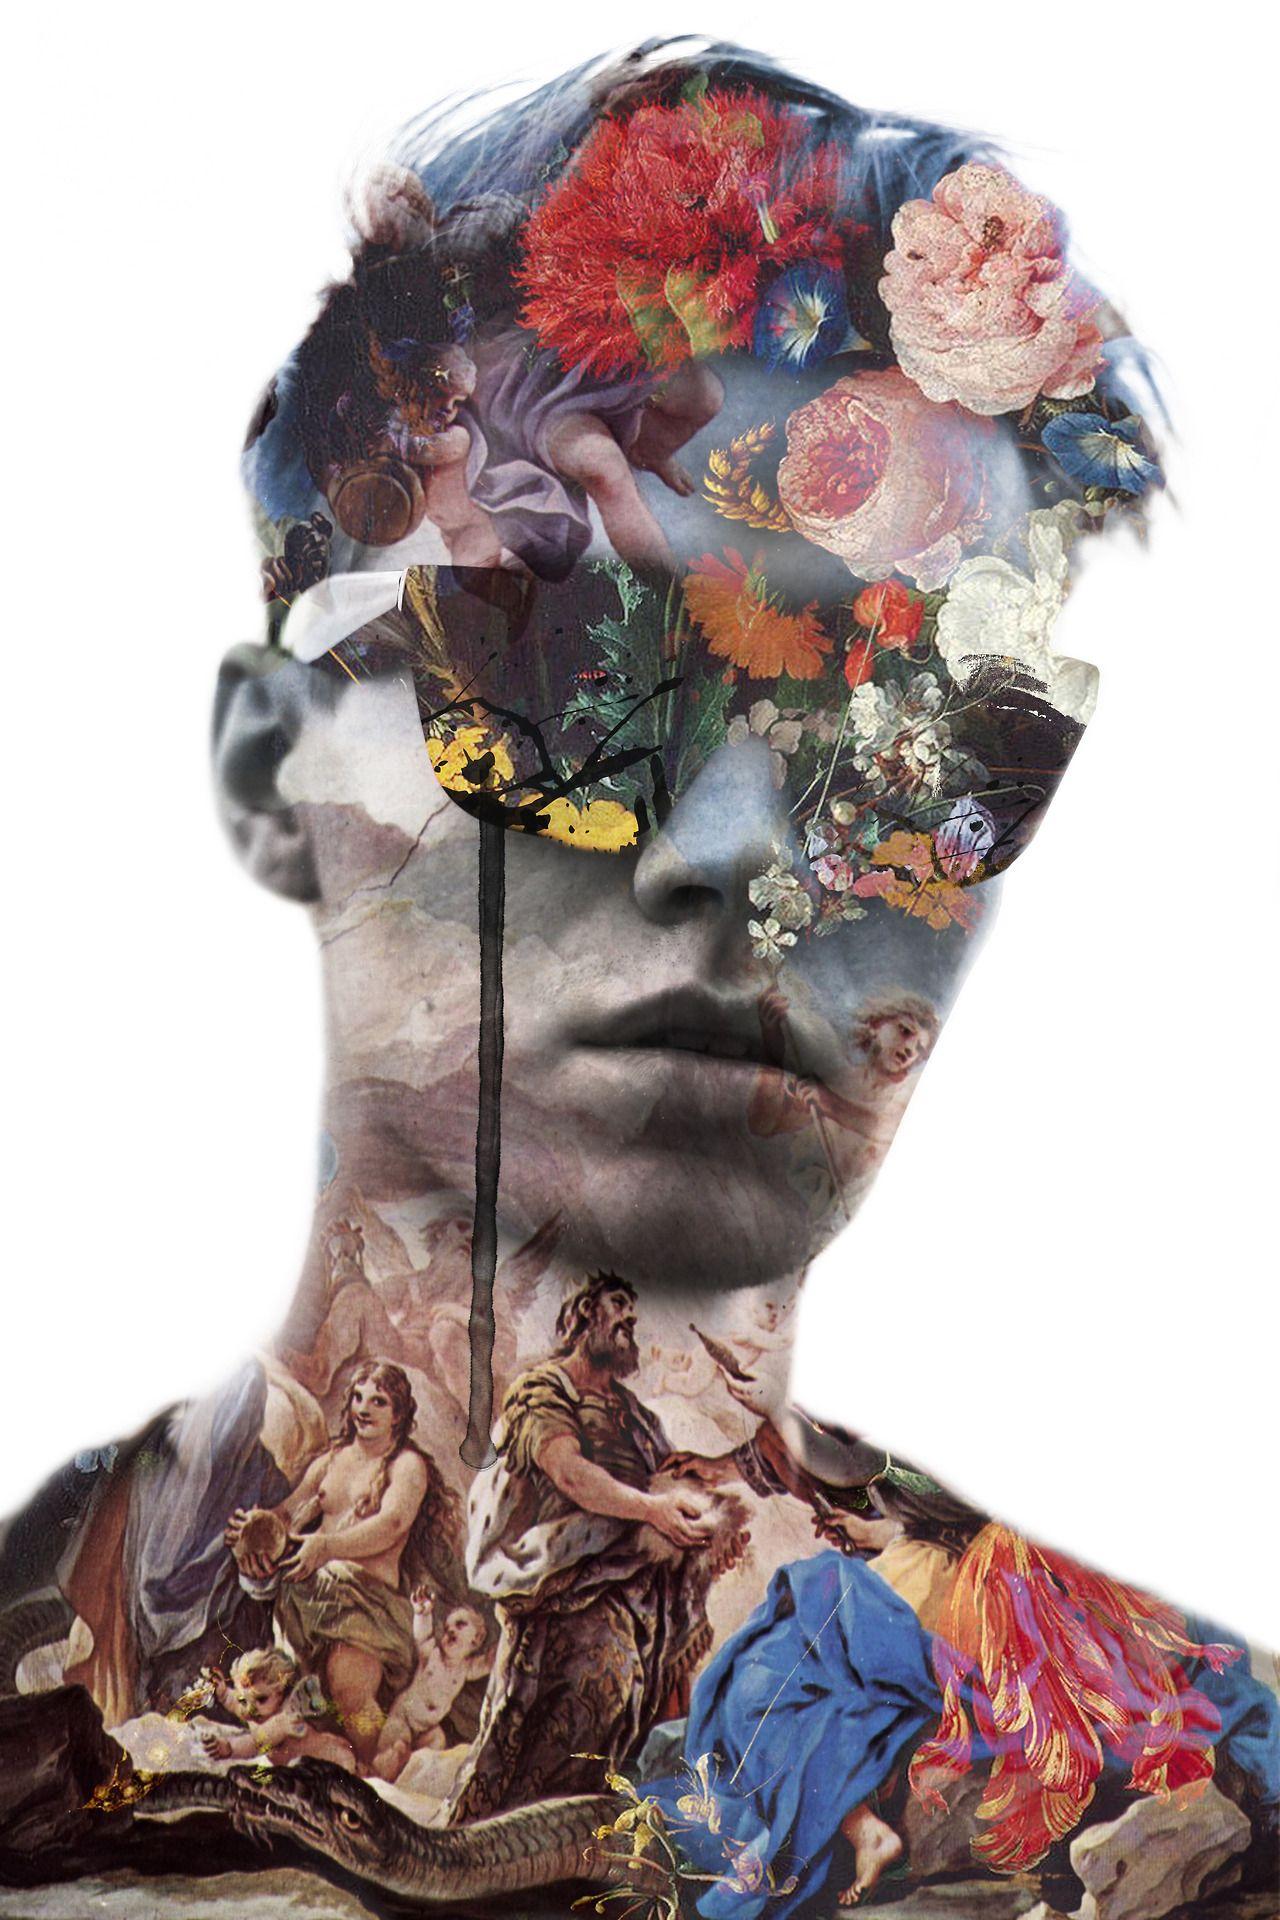 Digital collage